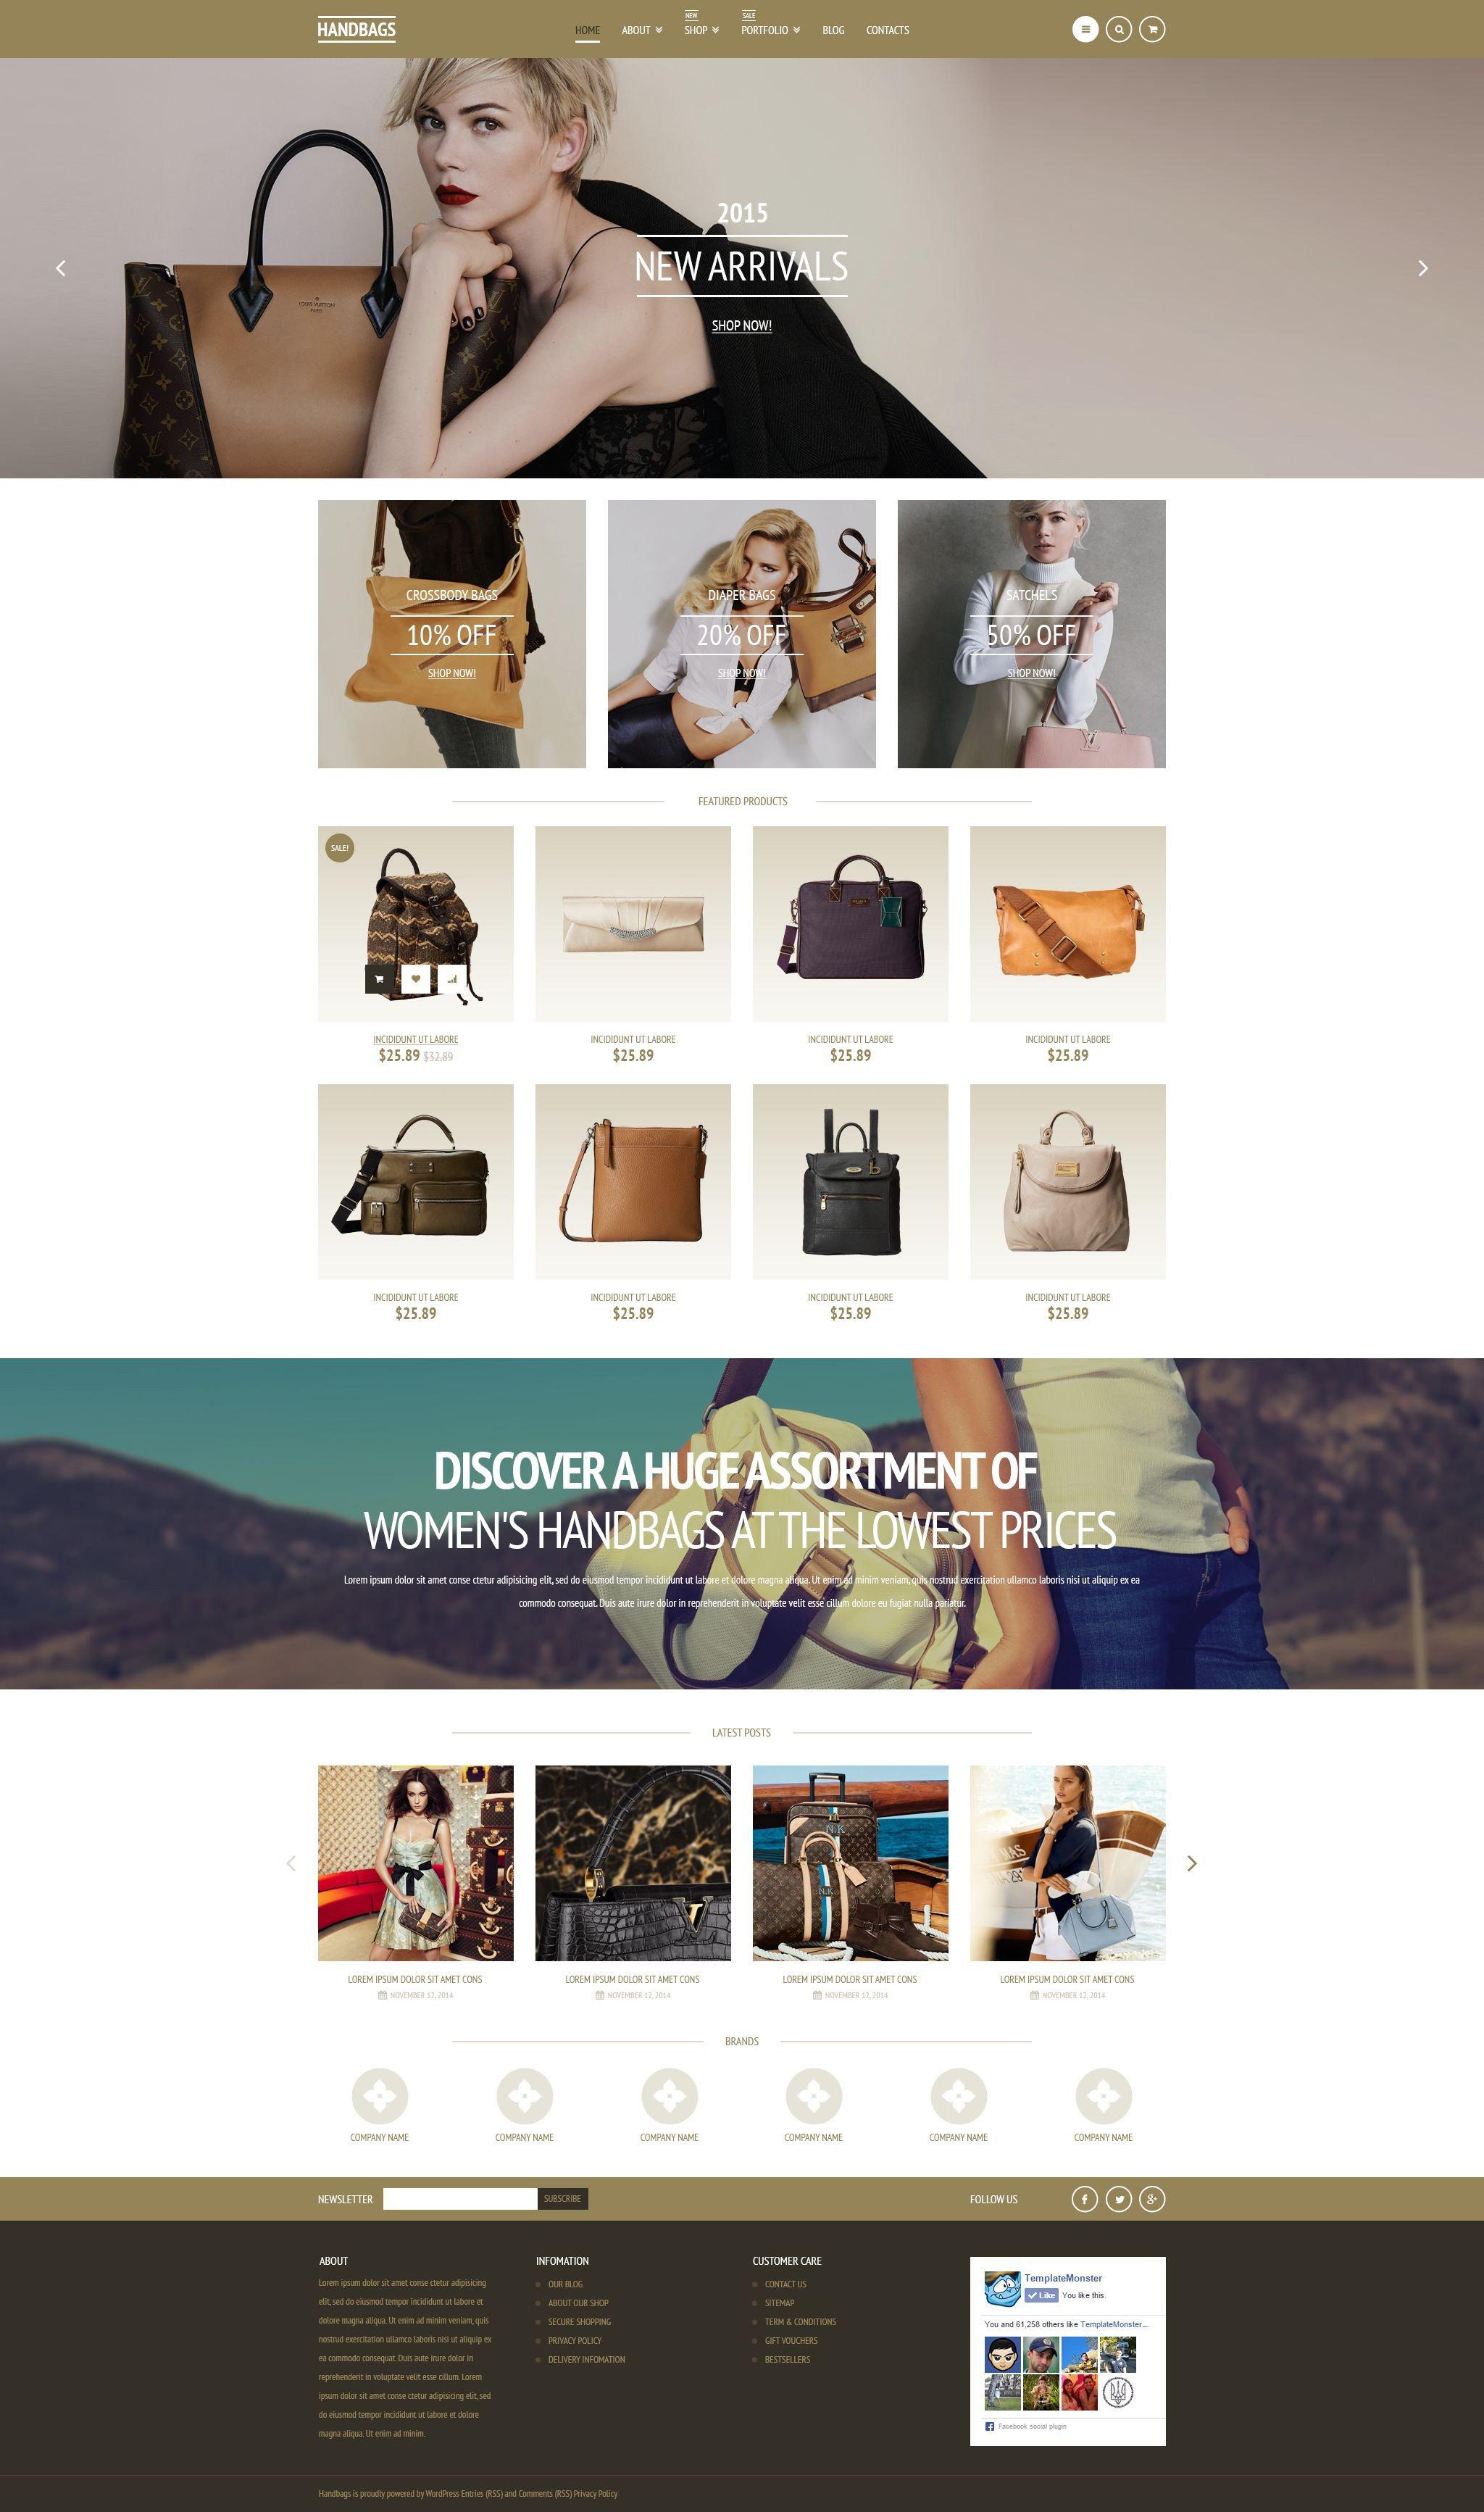 Elegant Handbags №53170 - скриншот